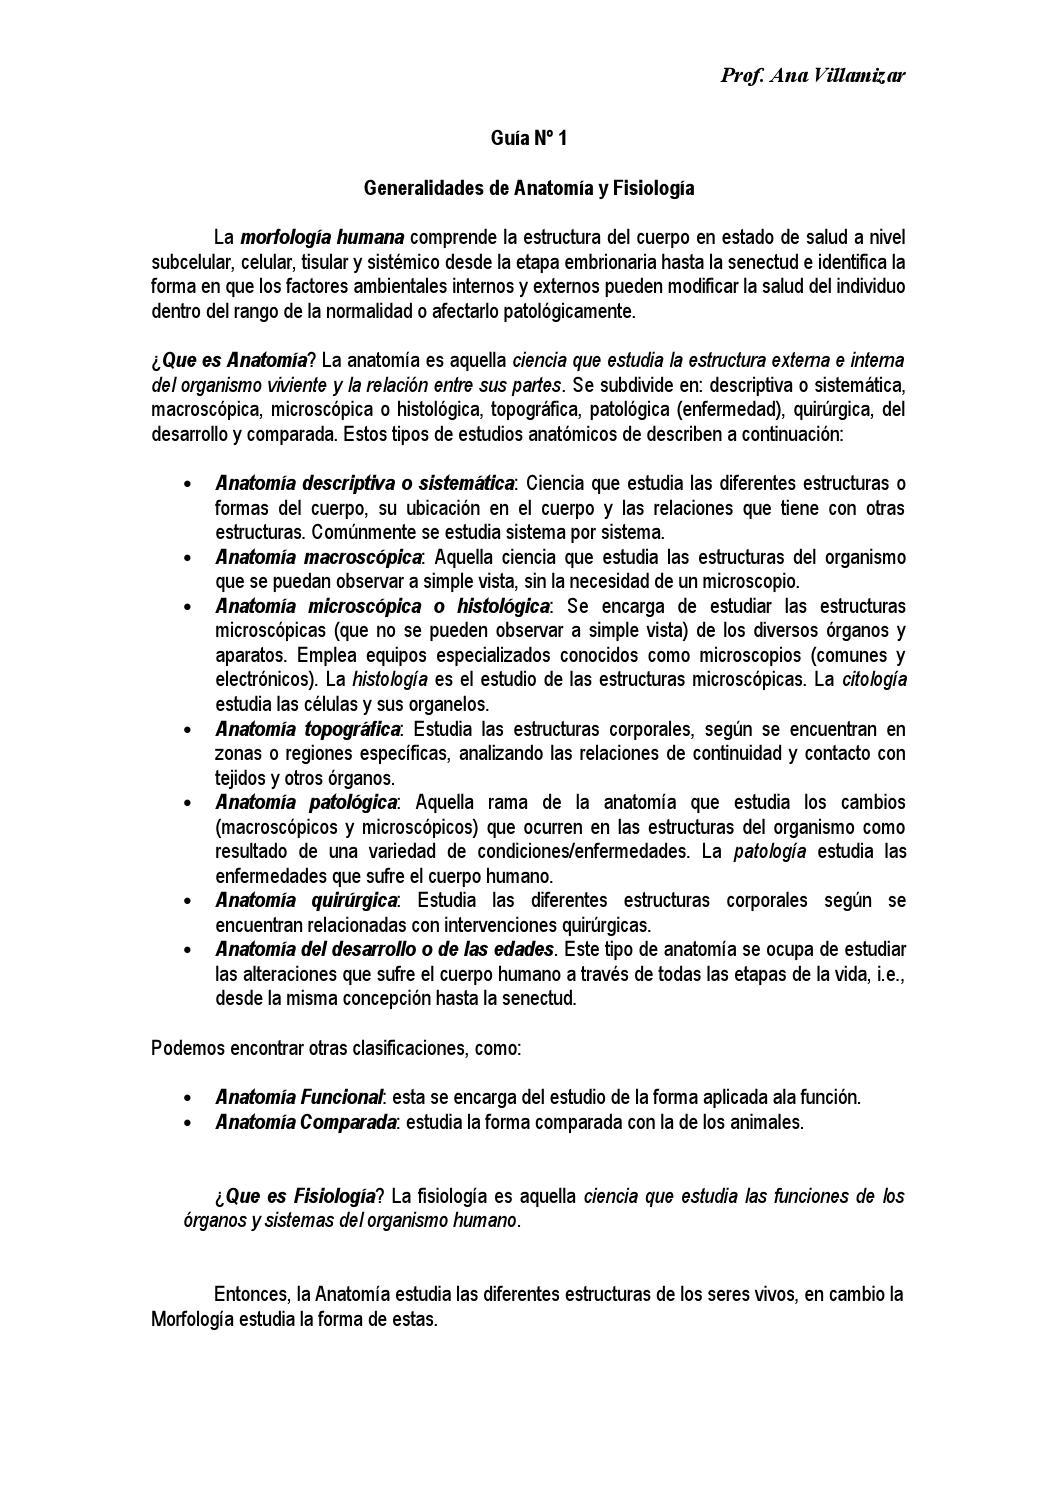 1 1 generalidades de morfologia by profanavillamizar@ - issuu